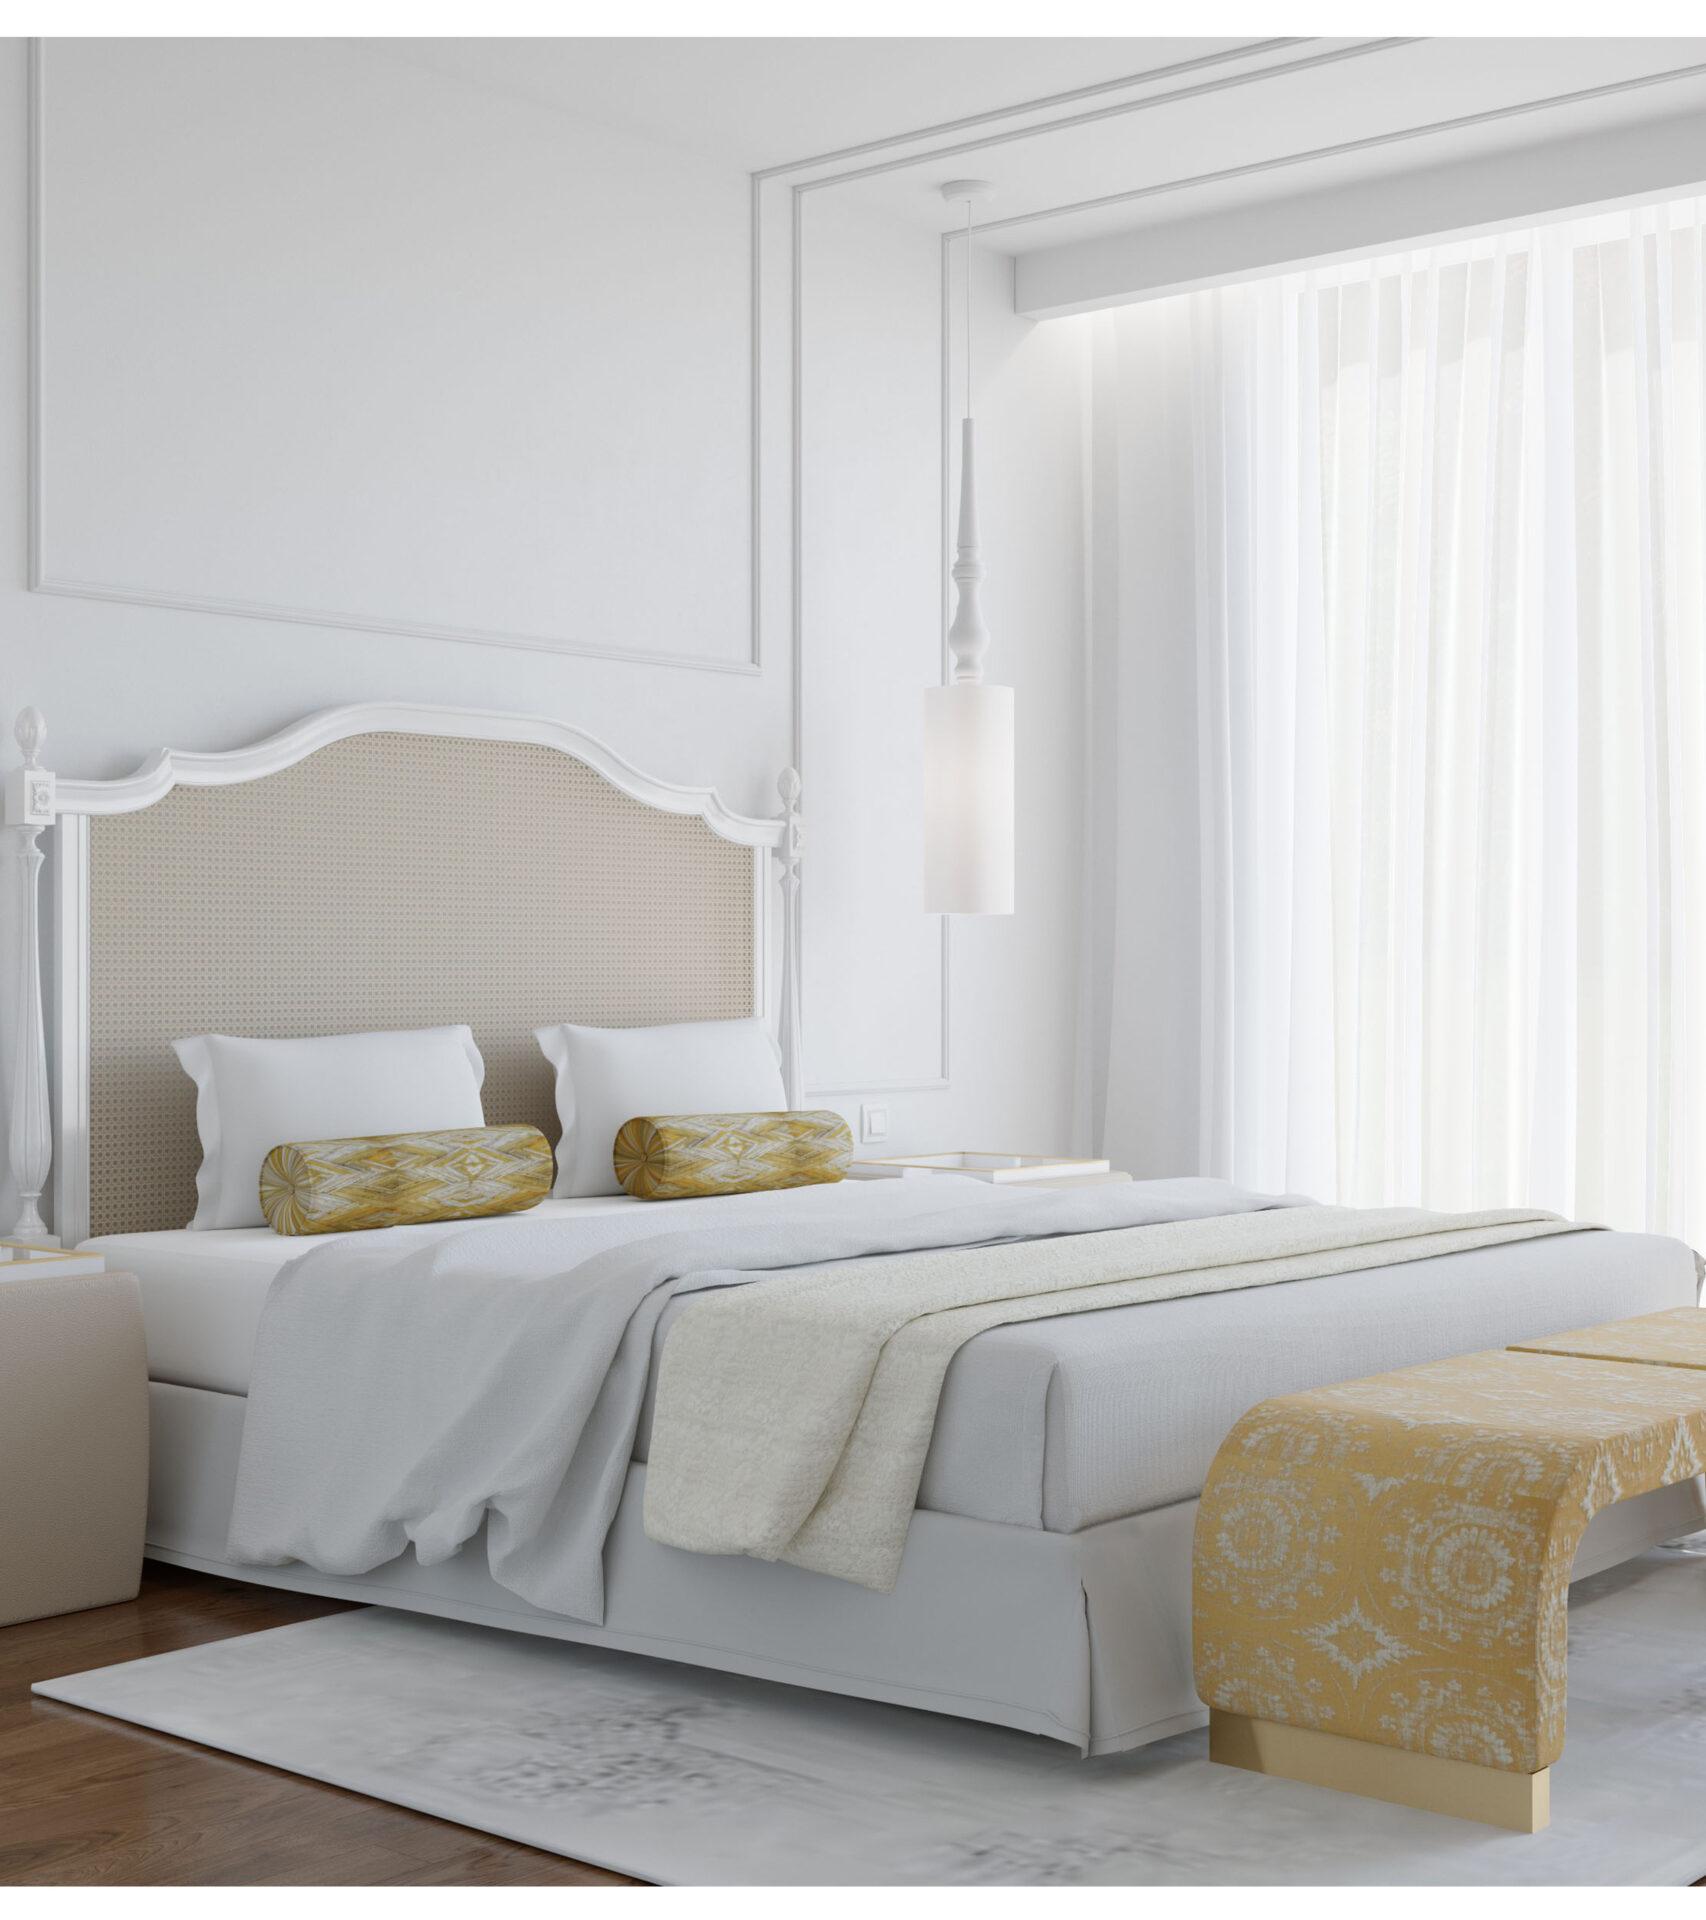 Jetclass (RU) Кровать Charme от португальского производителя Jetclass